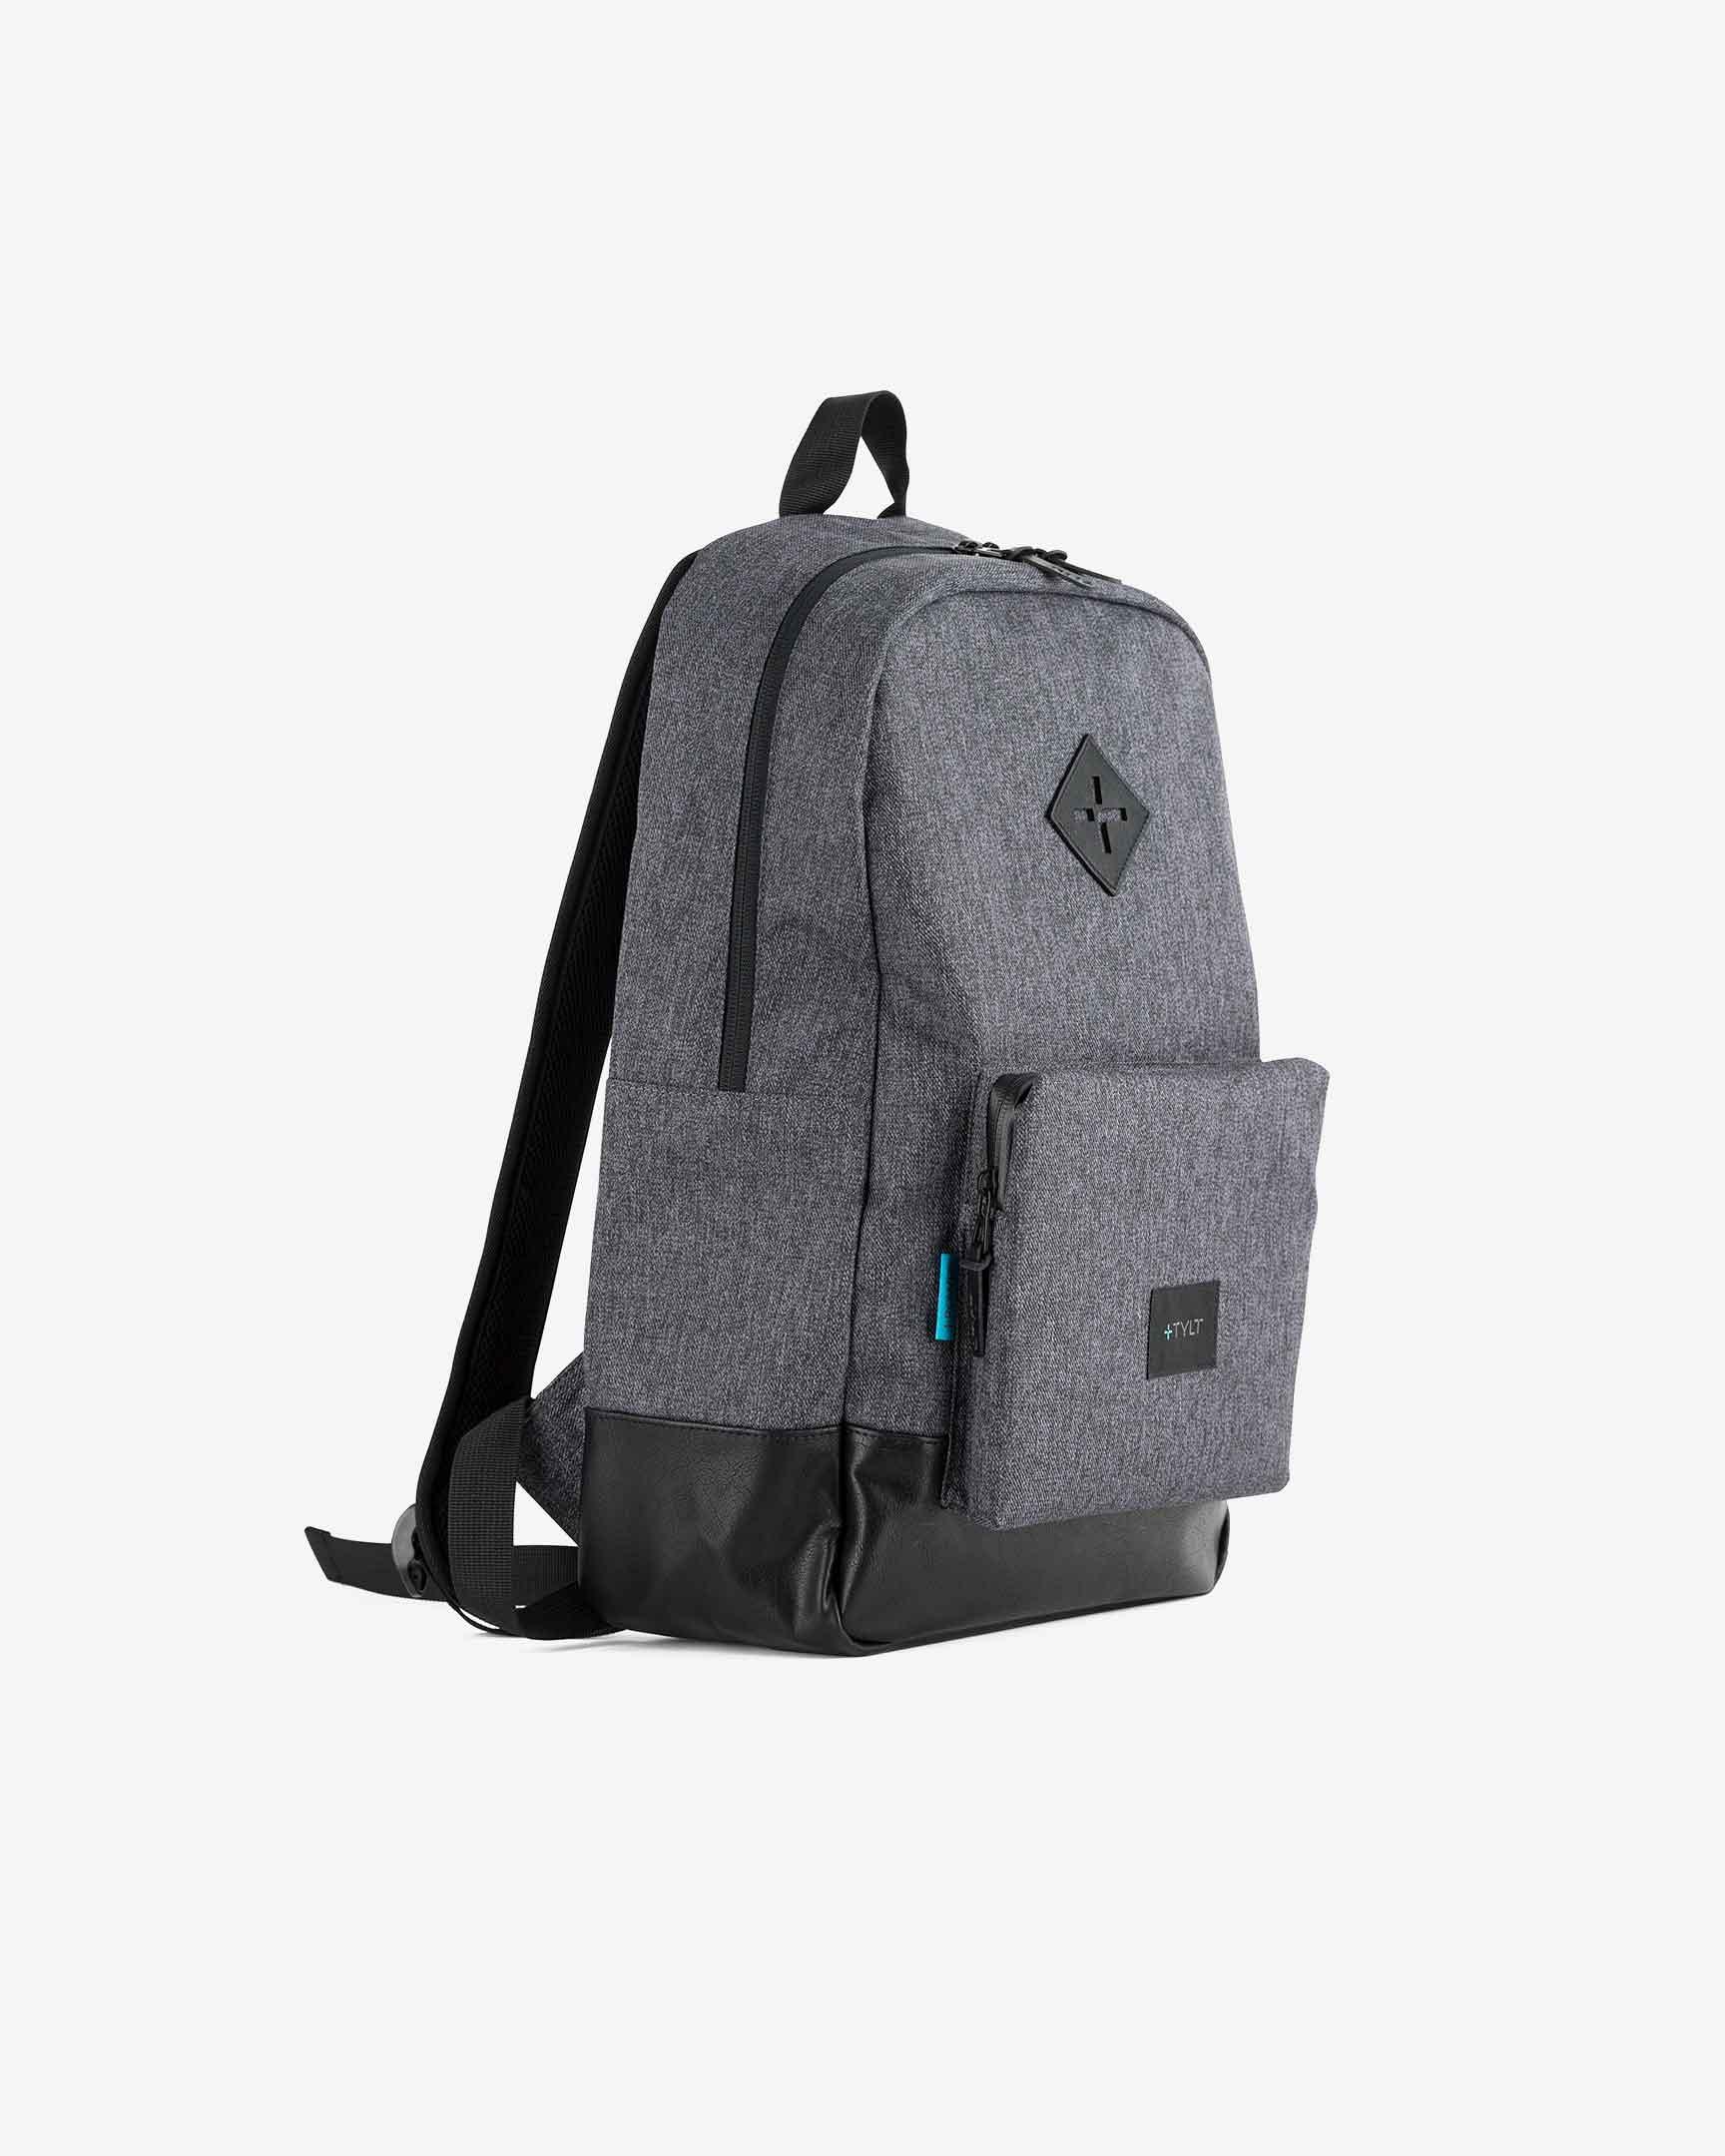 Active Power Bag side